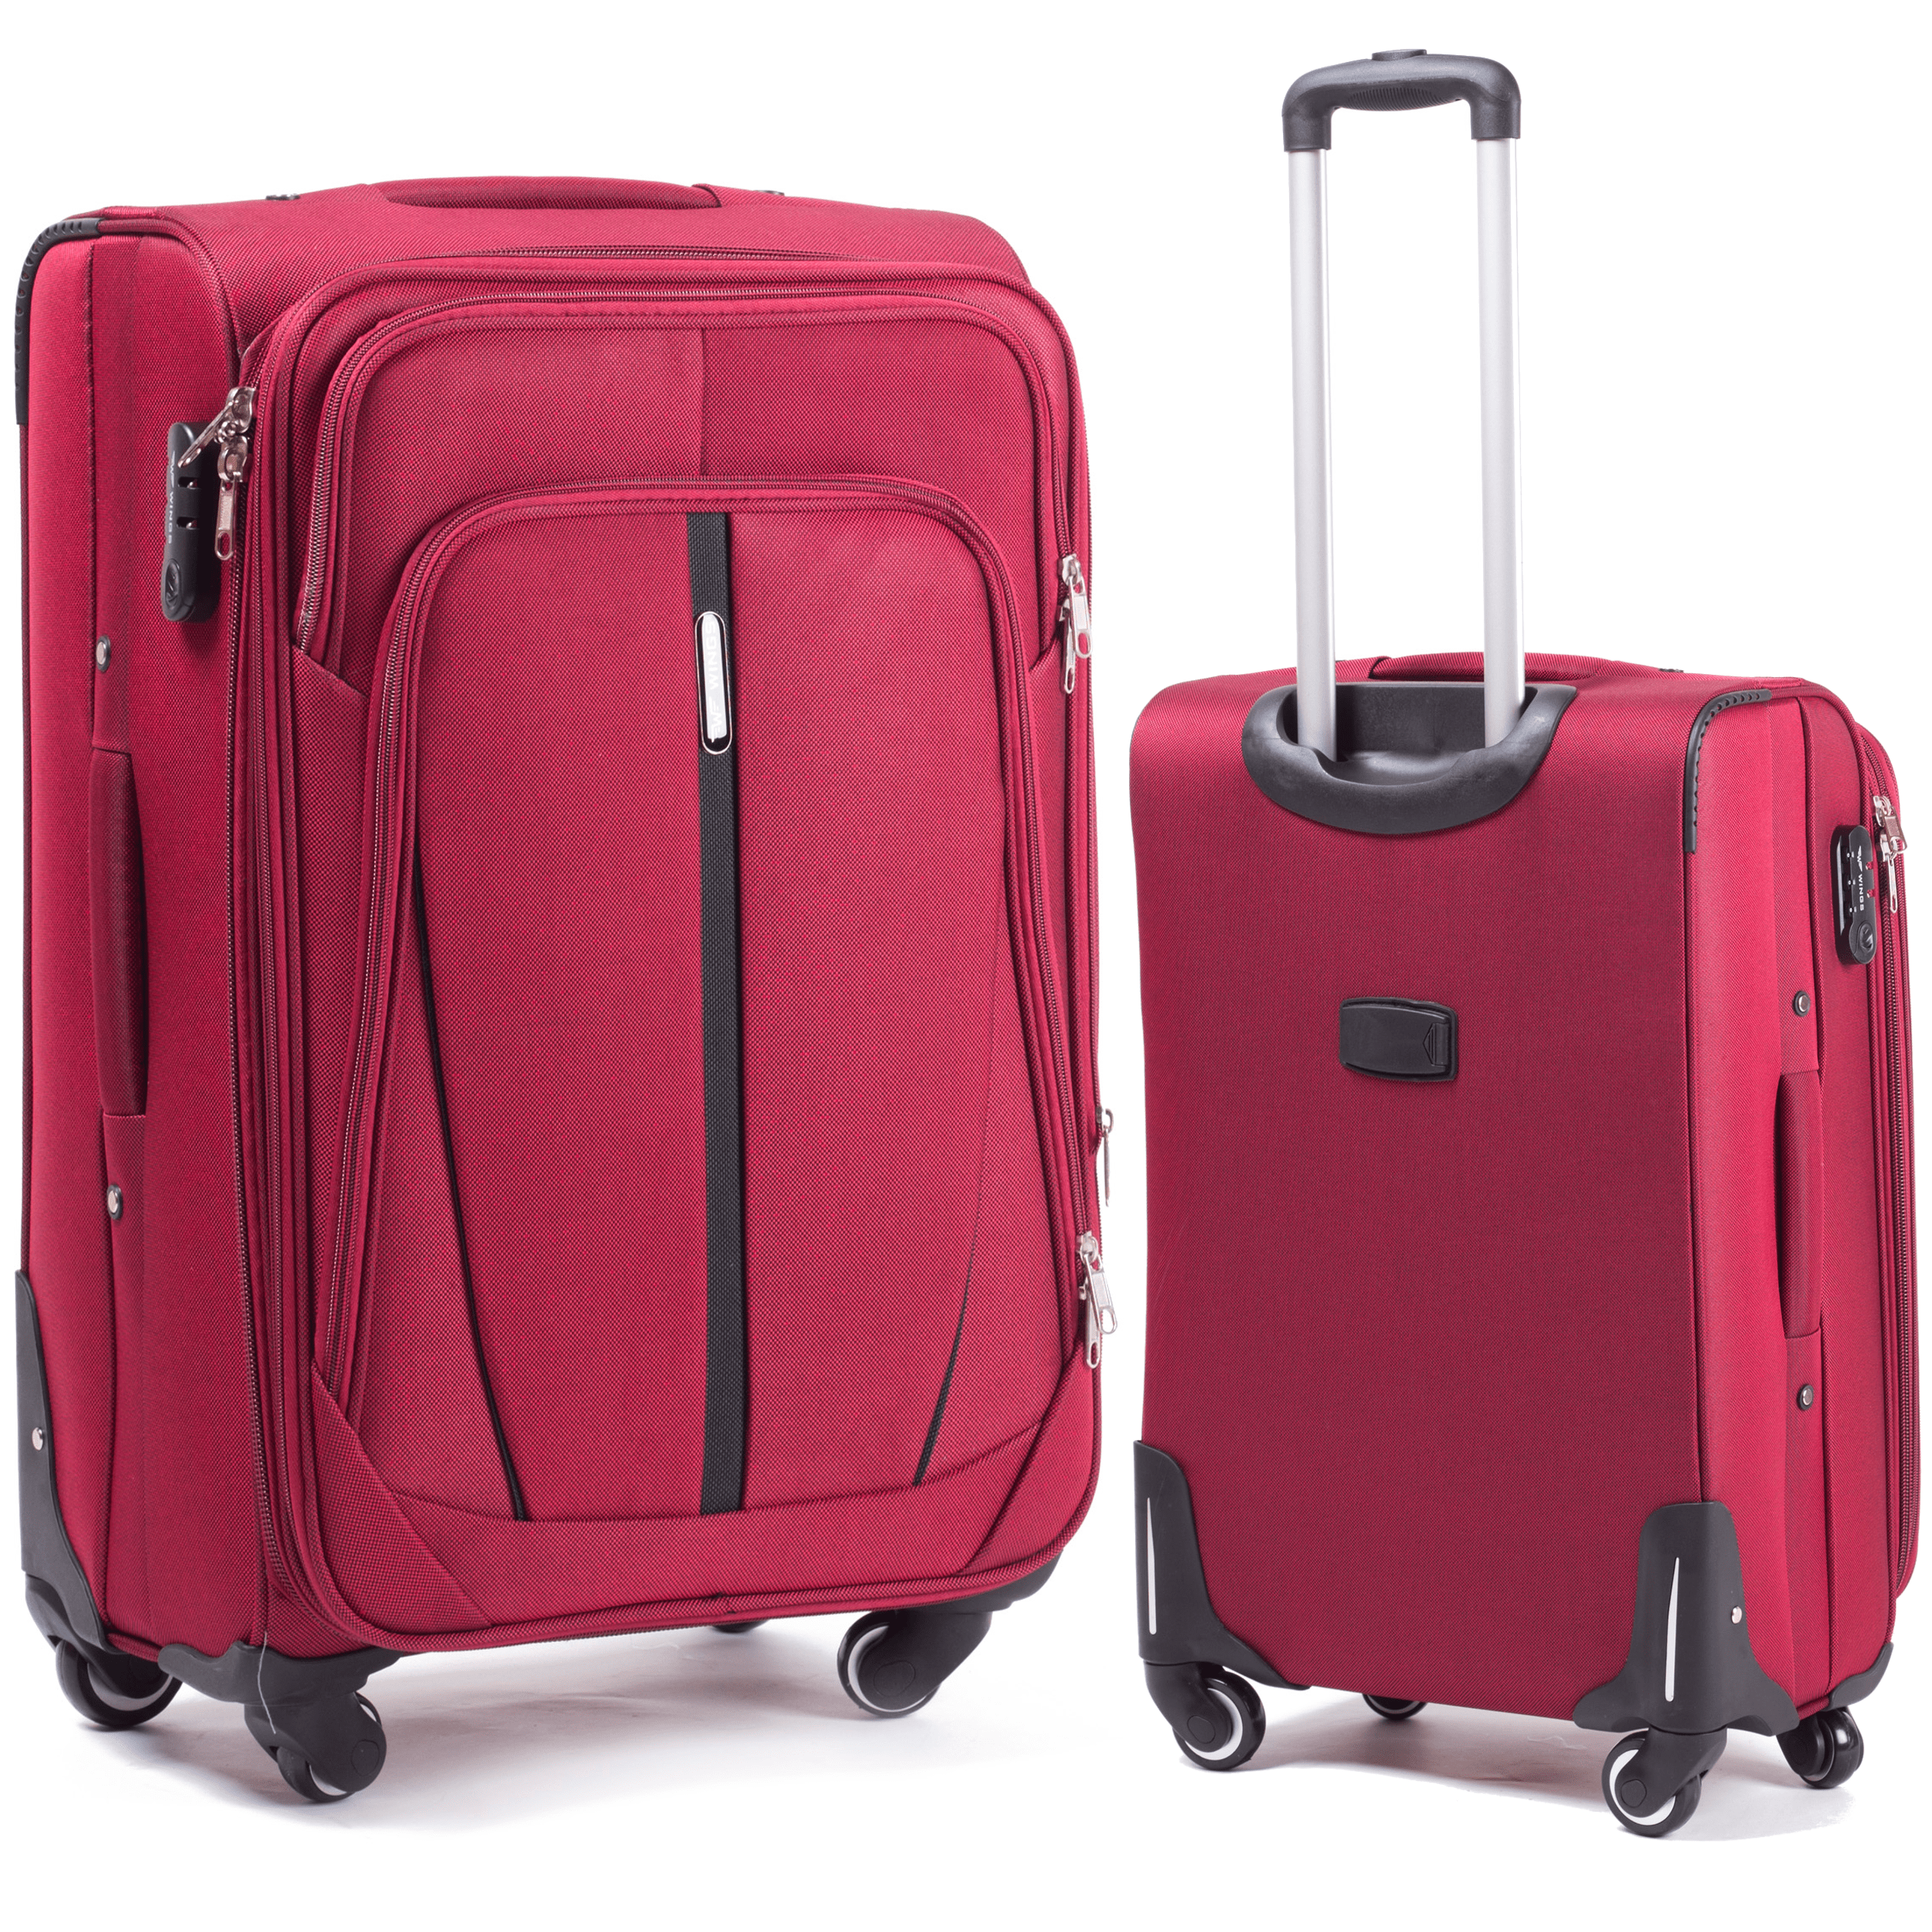 Большой Тканевый Чемодан Wings 1706-4 L Red PREMIUM на 4-х прочных колесах! Для багажа,до 23 кг